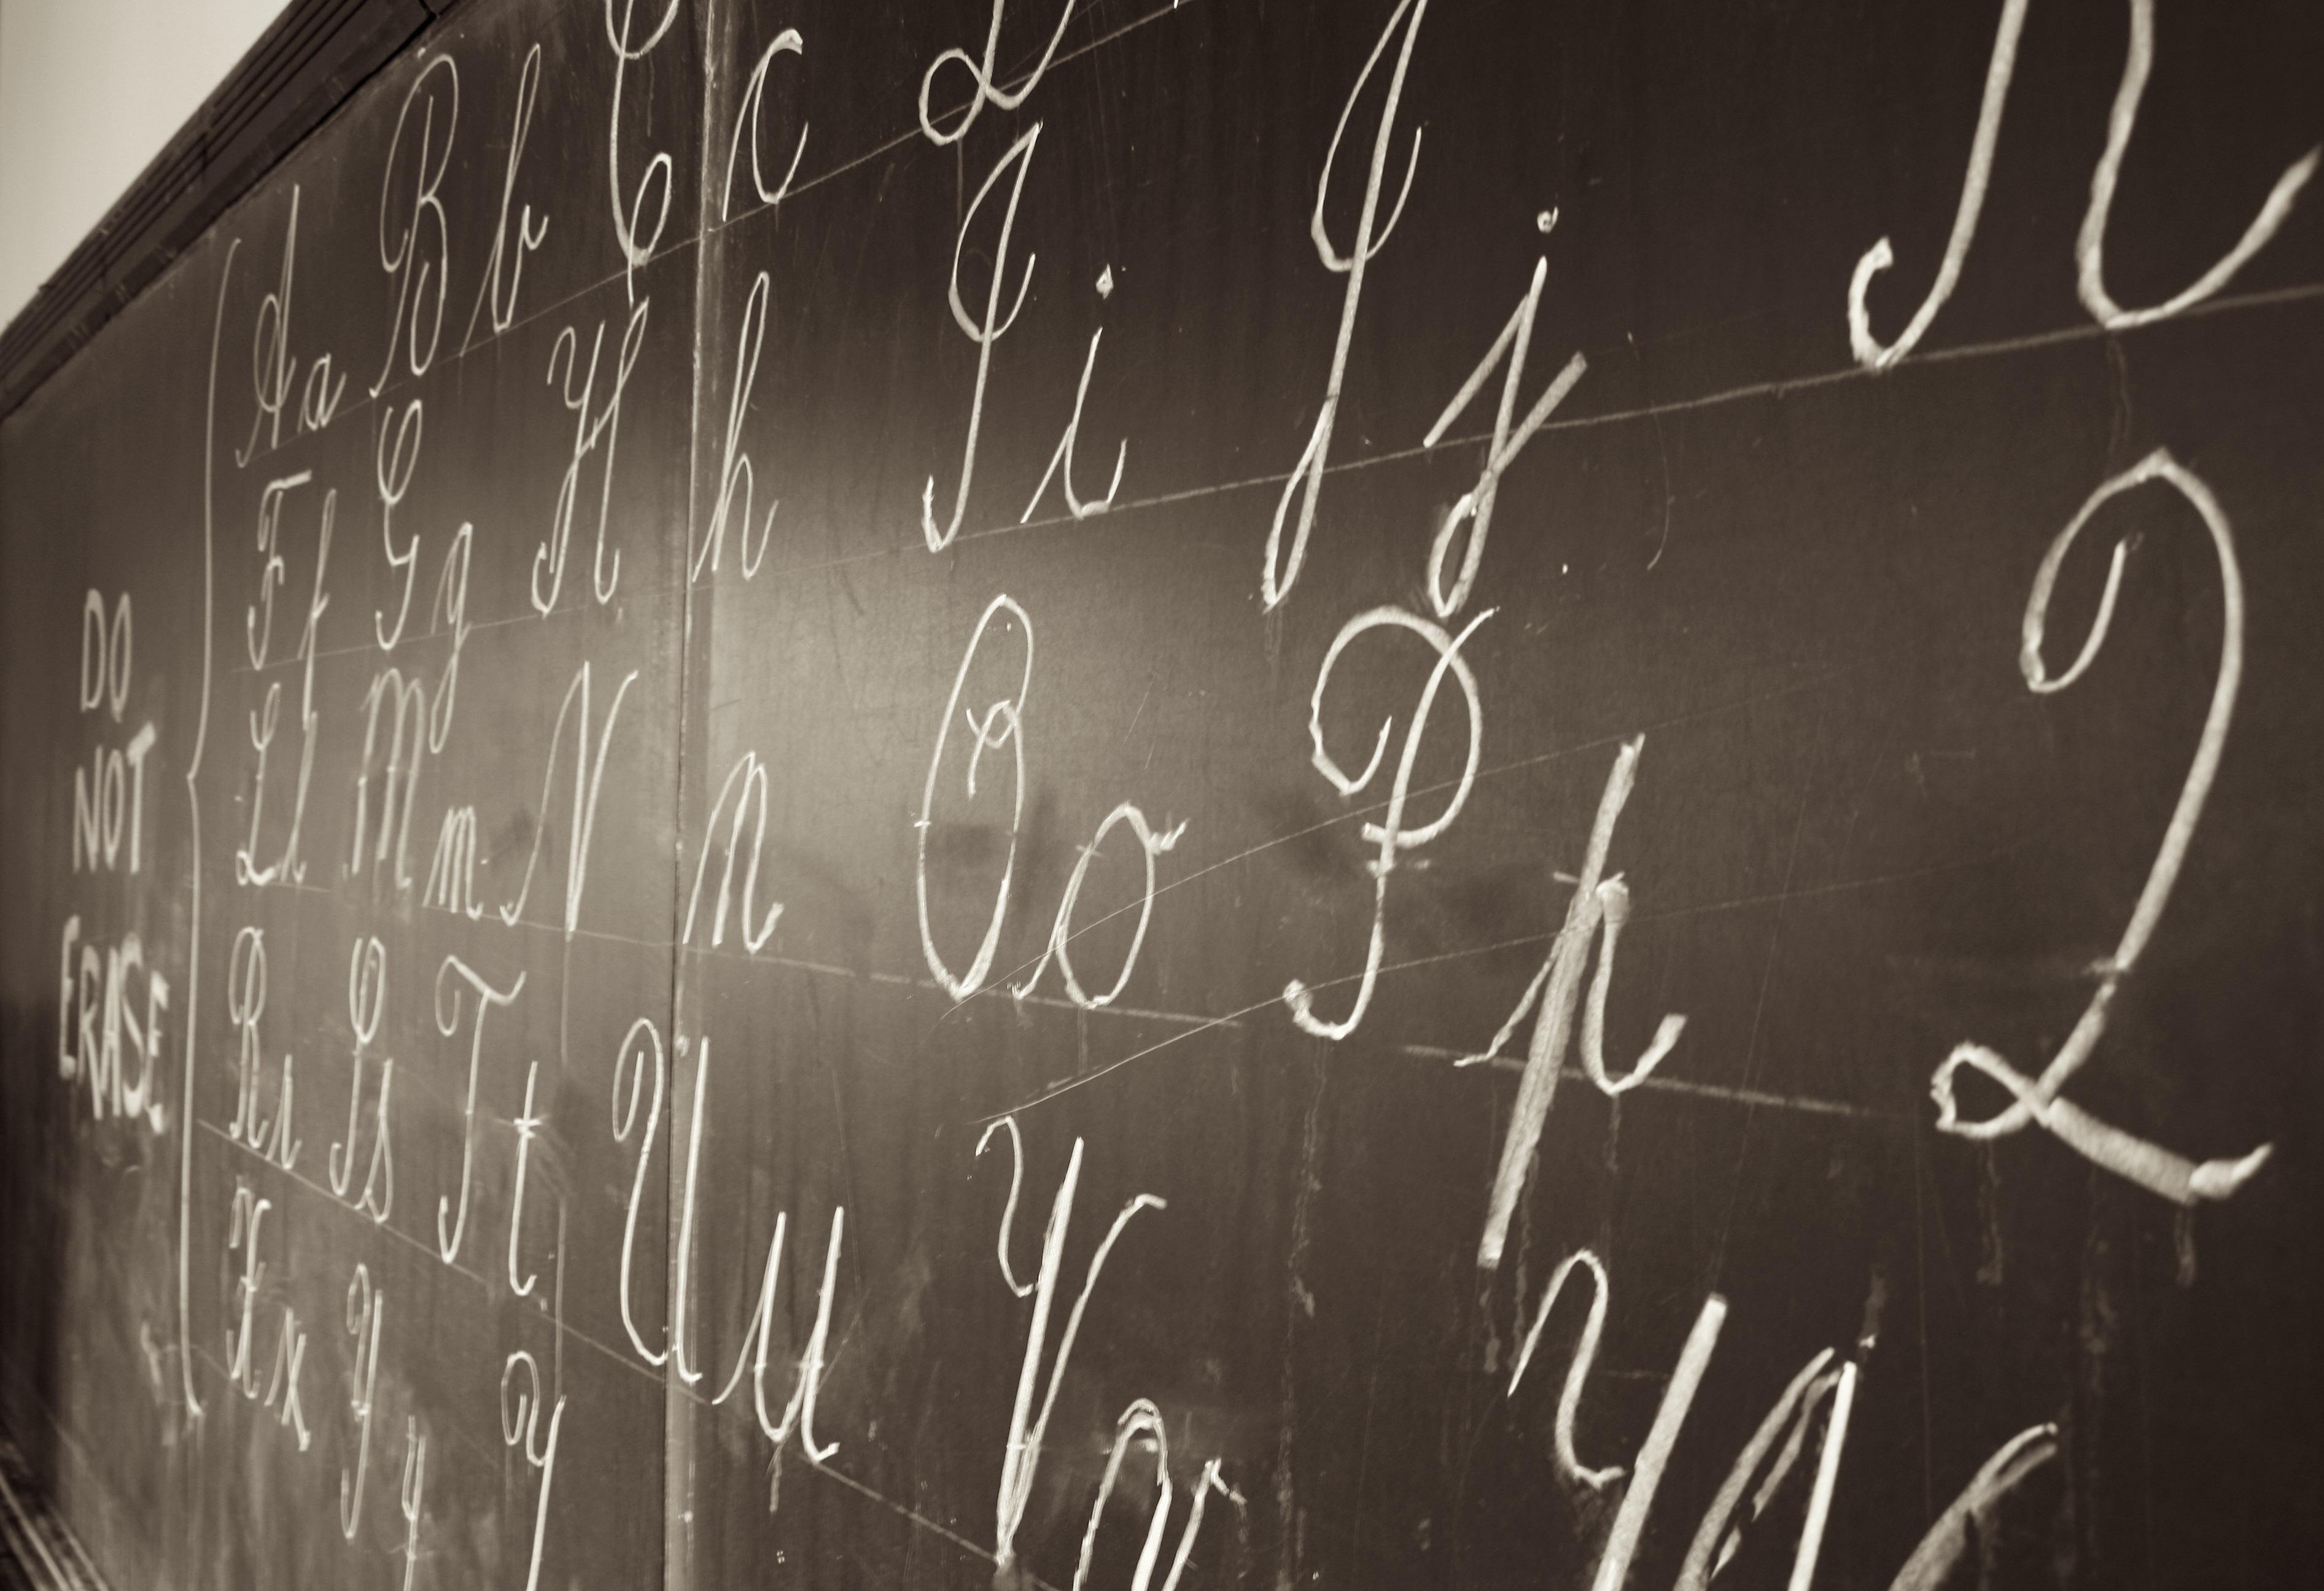 writing-black-and-white-white-running-smooth-blackboard-1007876-pxhere.com